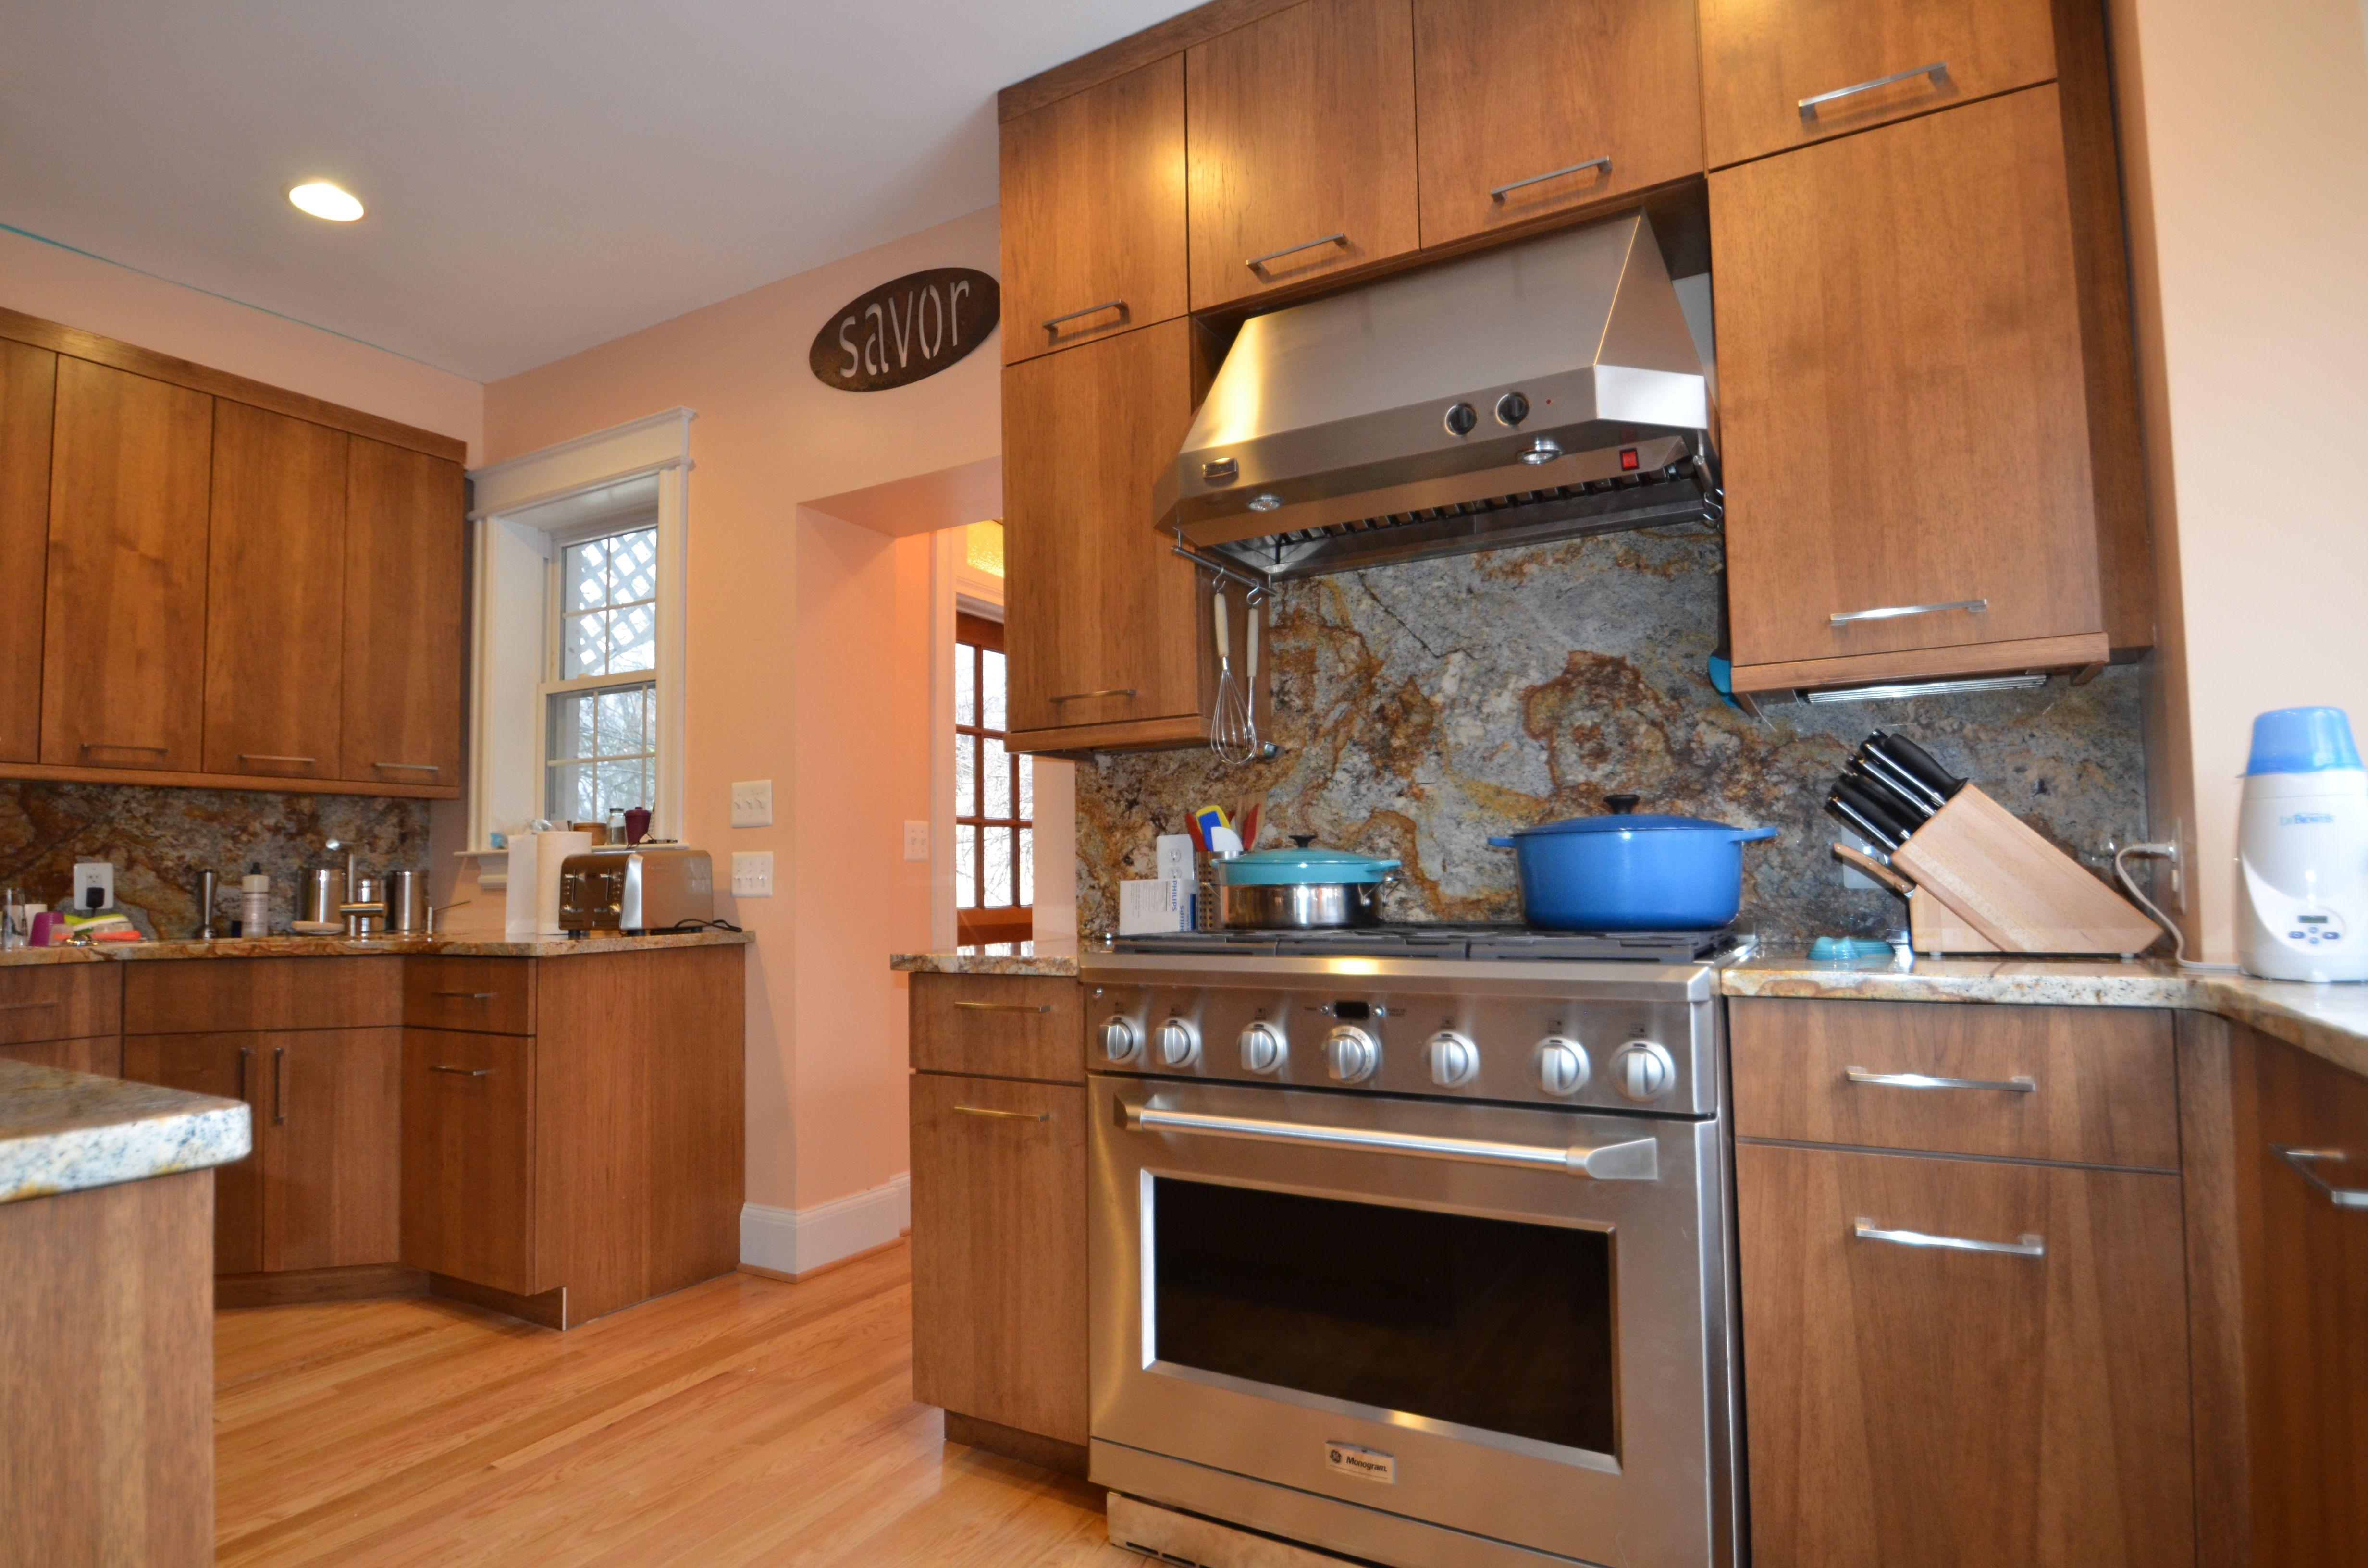 Chestnut Stain On Hickory See Our Rockville Showroom Sunday Kitchen Bath 240 314 7011 Talk Kitchen Cabinet Design Kitchen Design Hickory Kitchen Cabinets